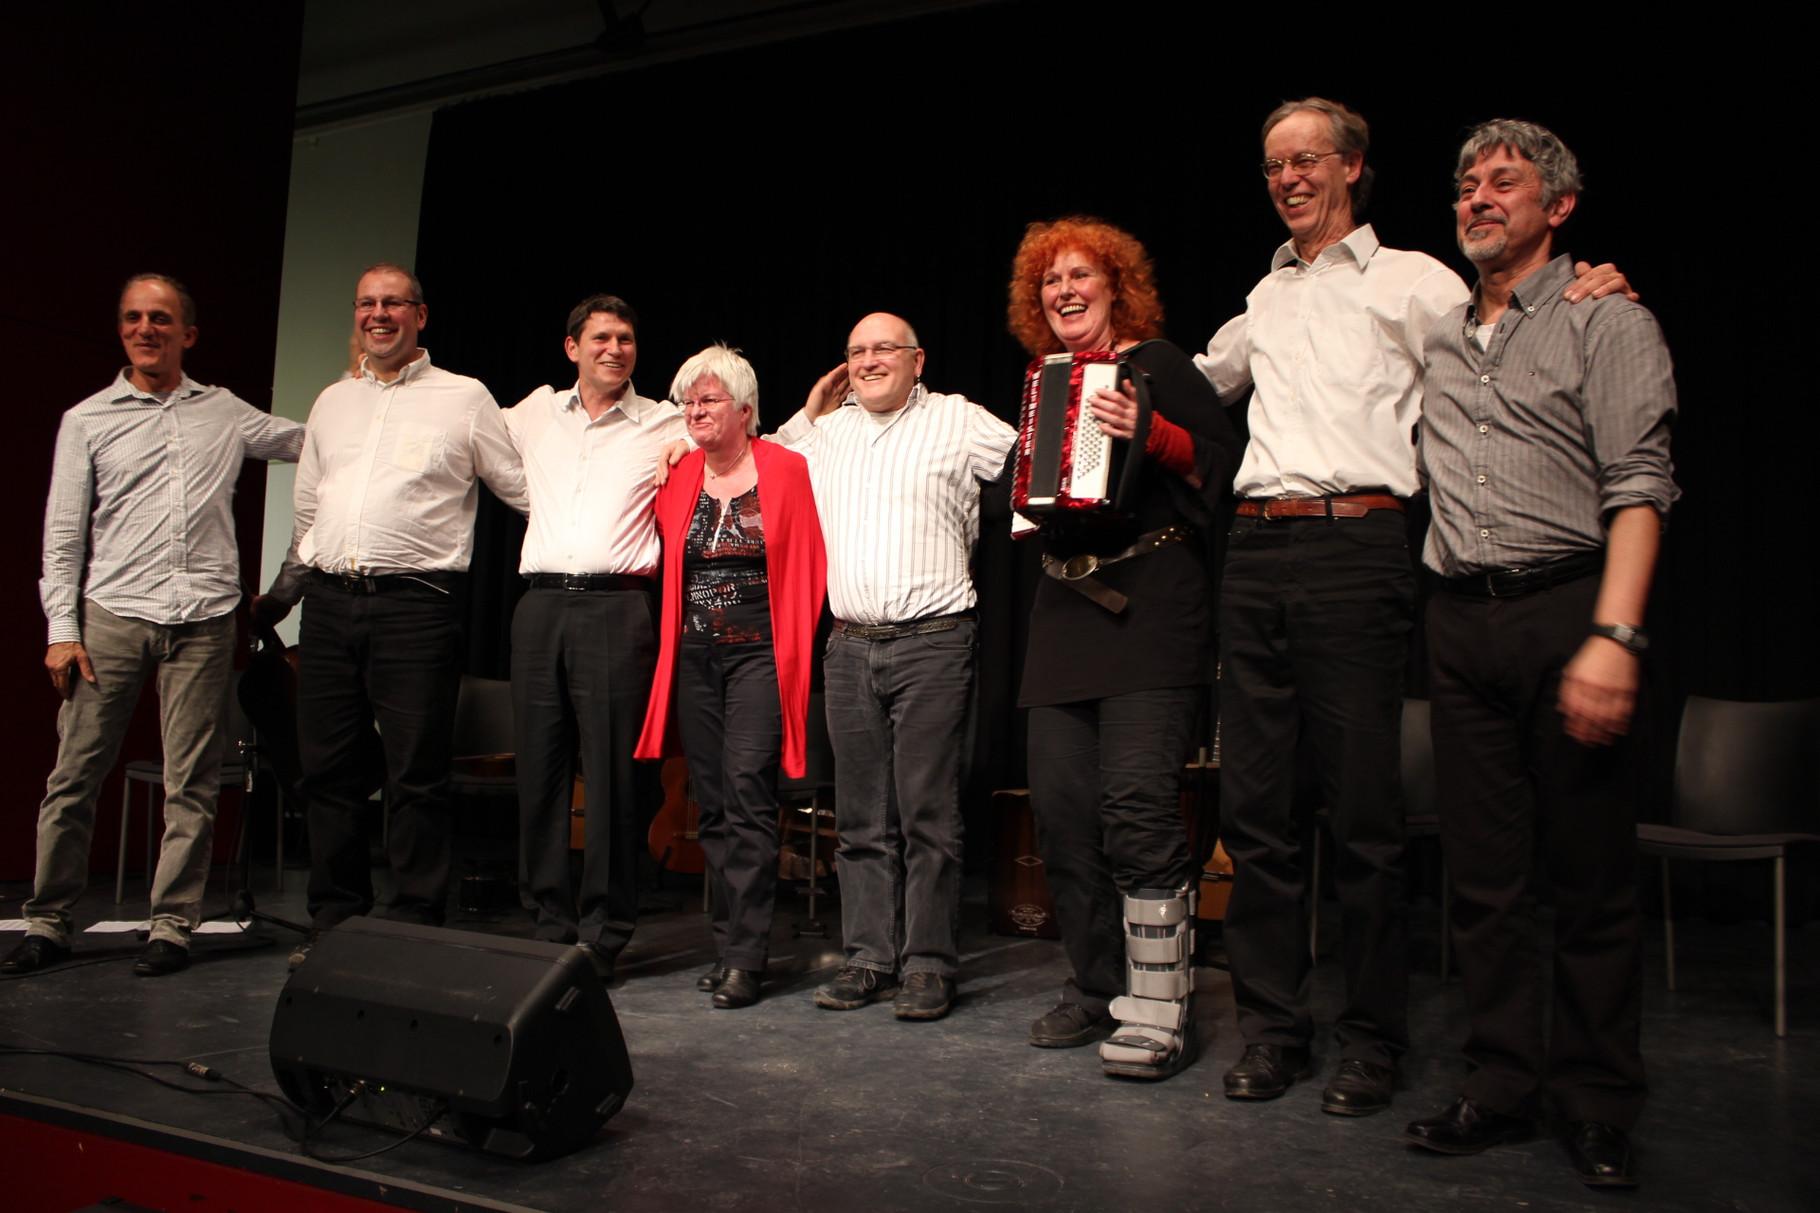 Konzert mit Ahmed el Salamouny und Gilson de Assis